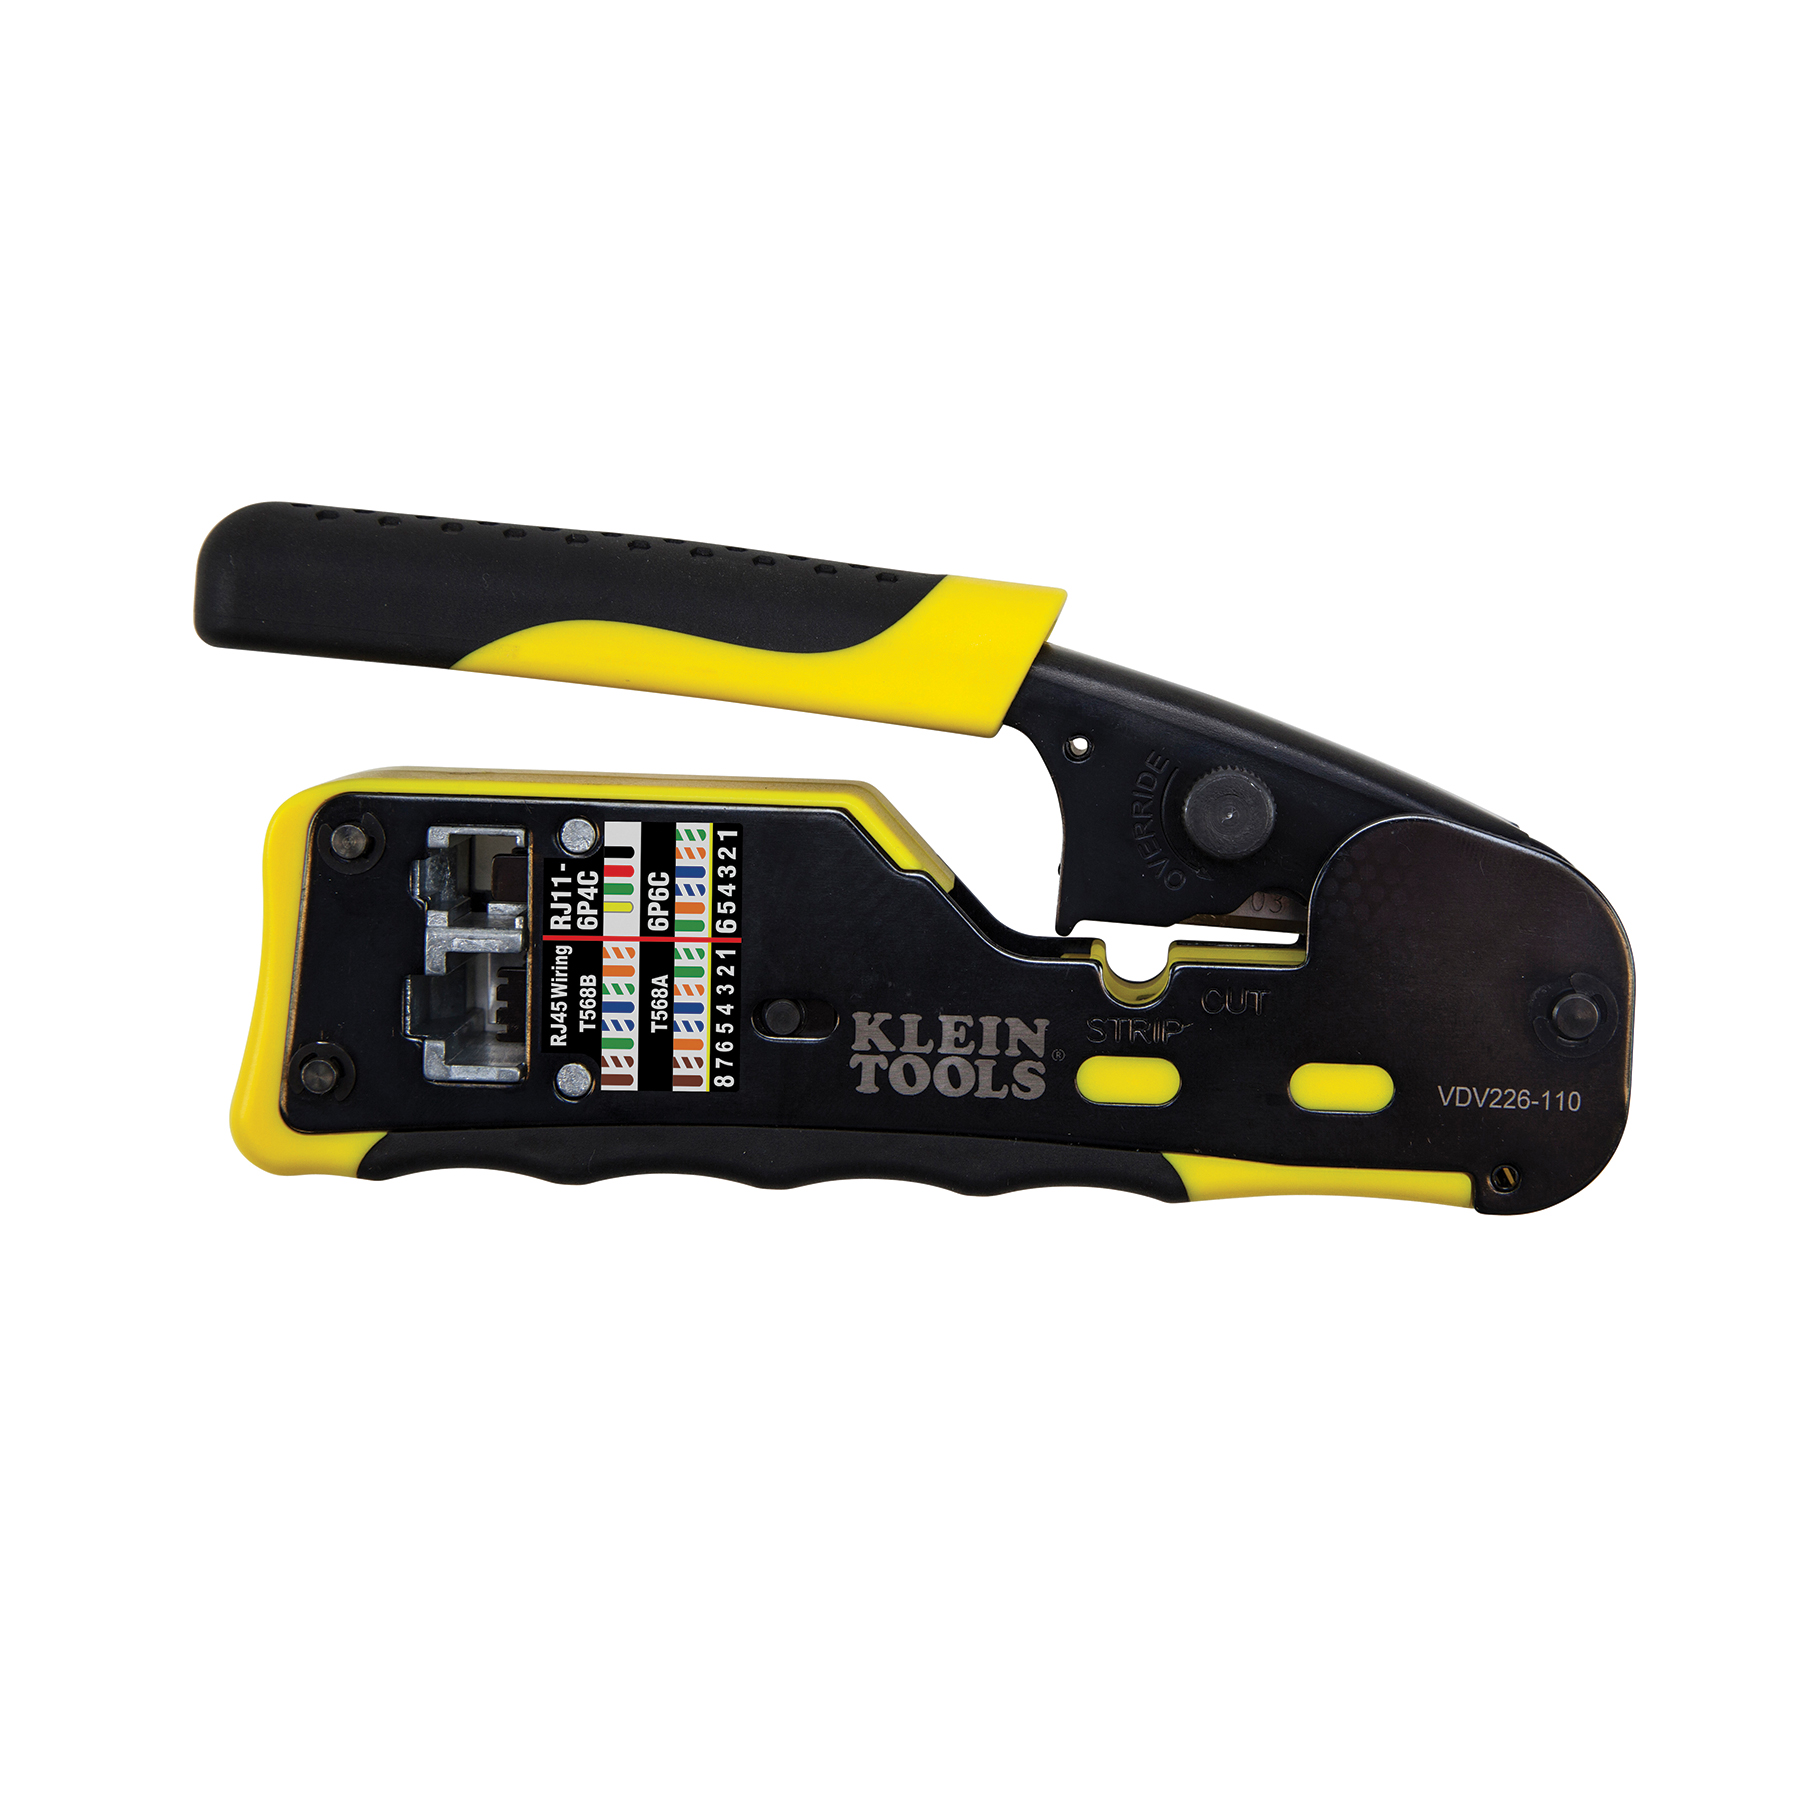 Ratcheting Pass-Thru™ Modular Crimper - VDV226-110